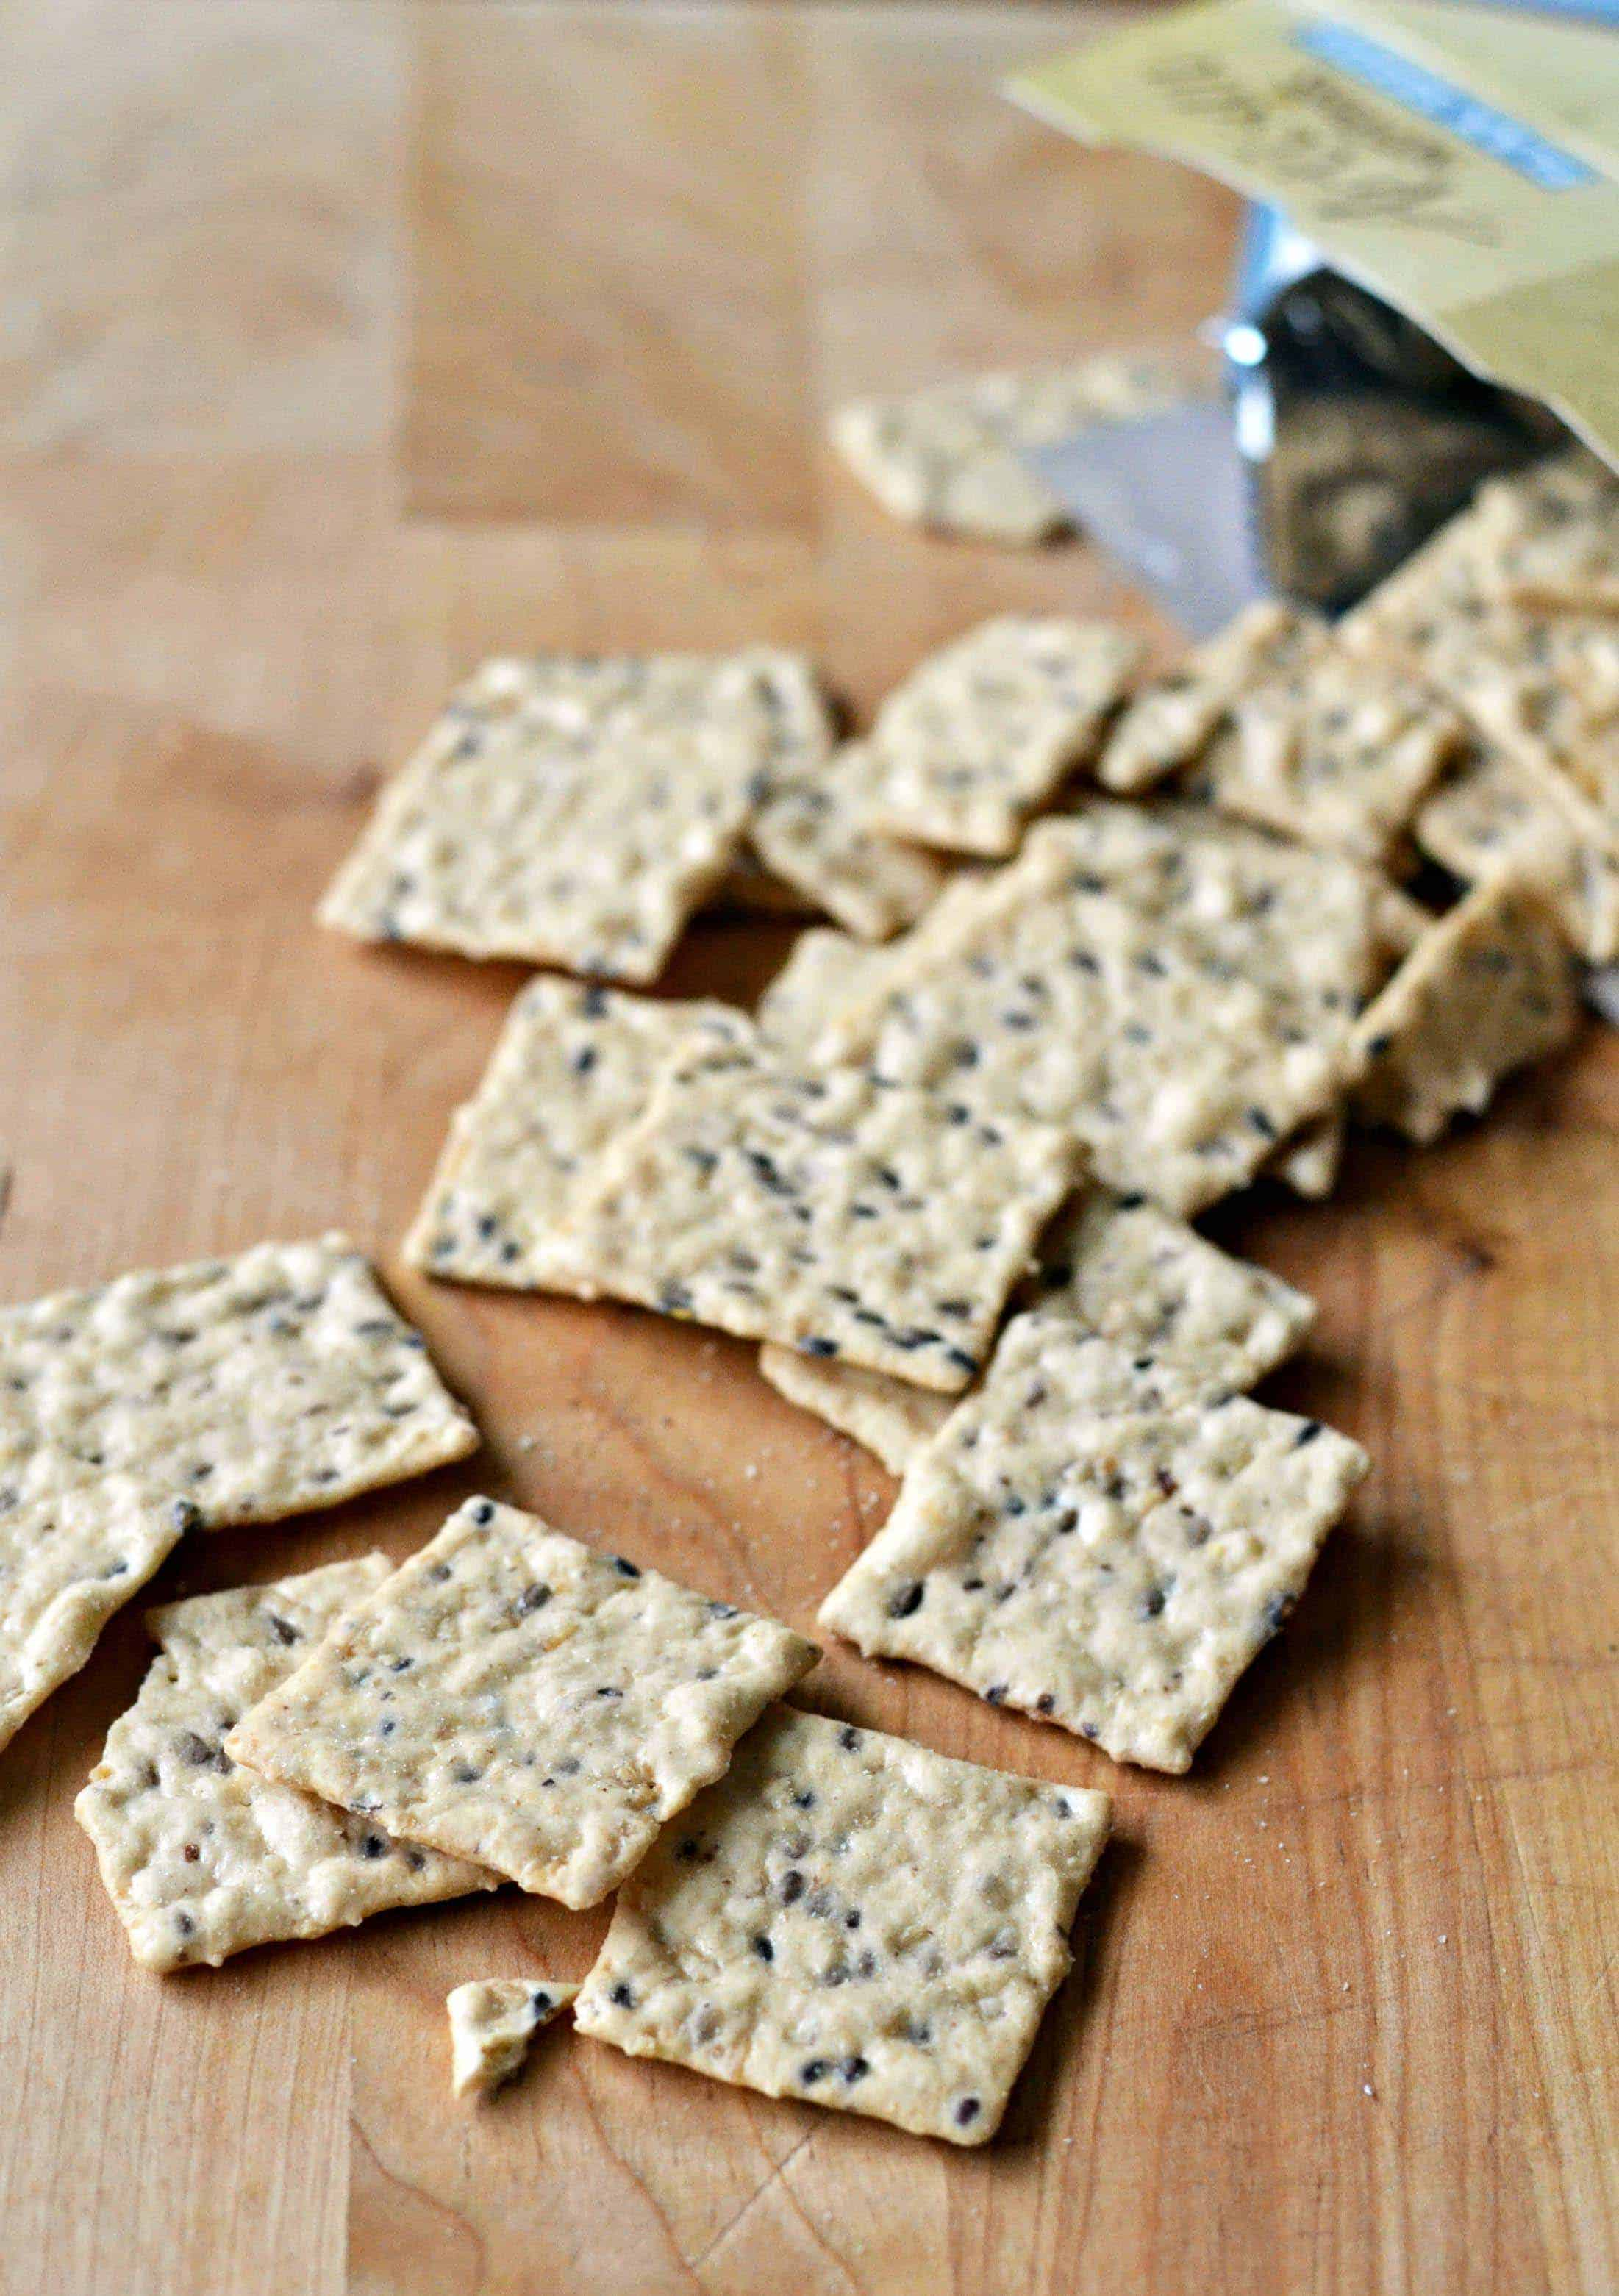 Blue Diamond crackers on a board